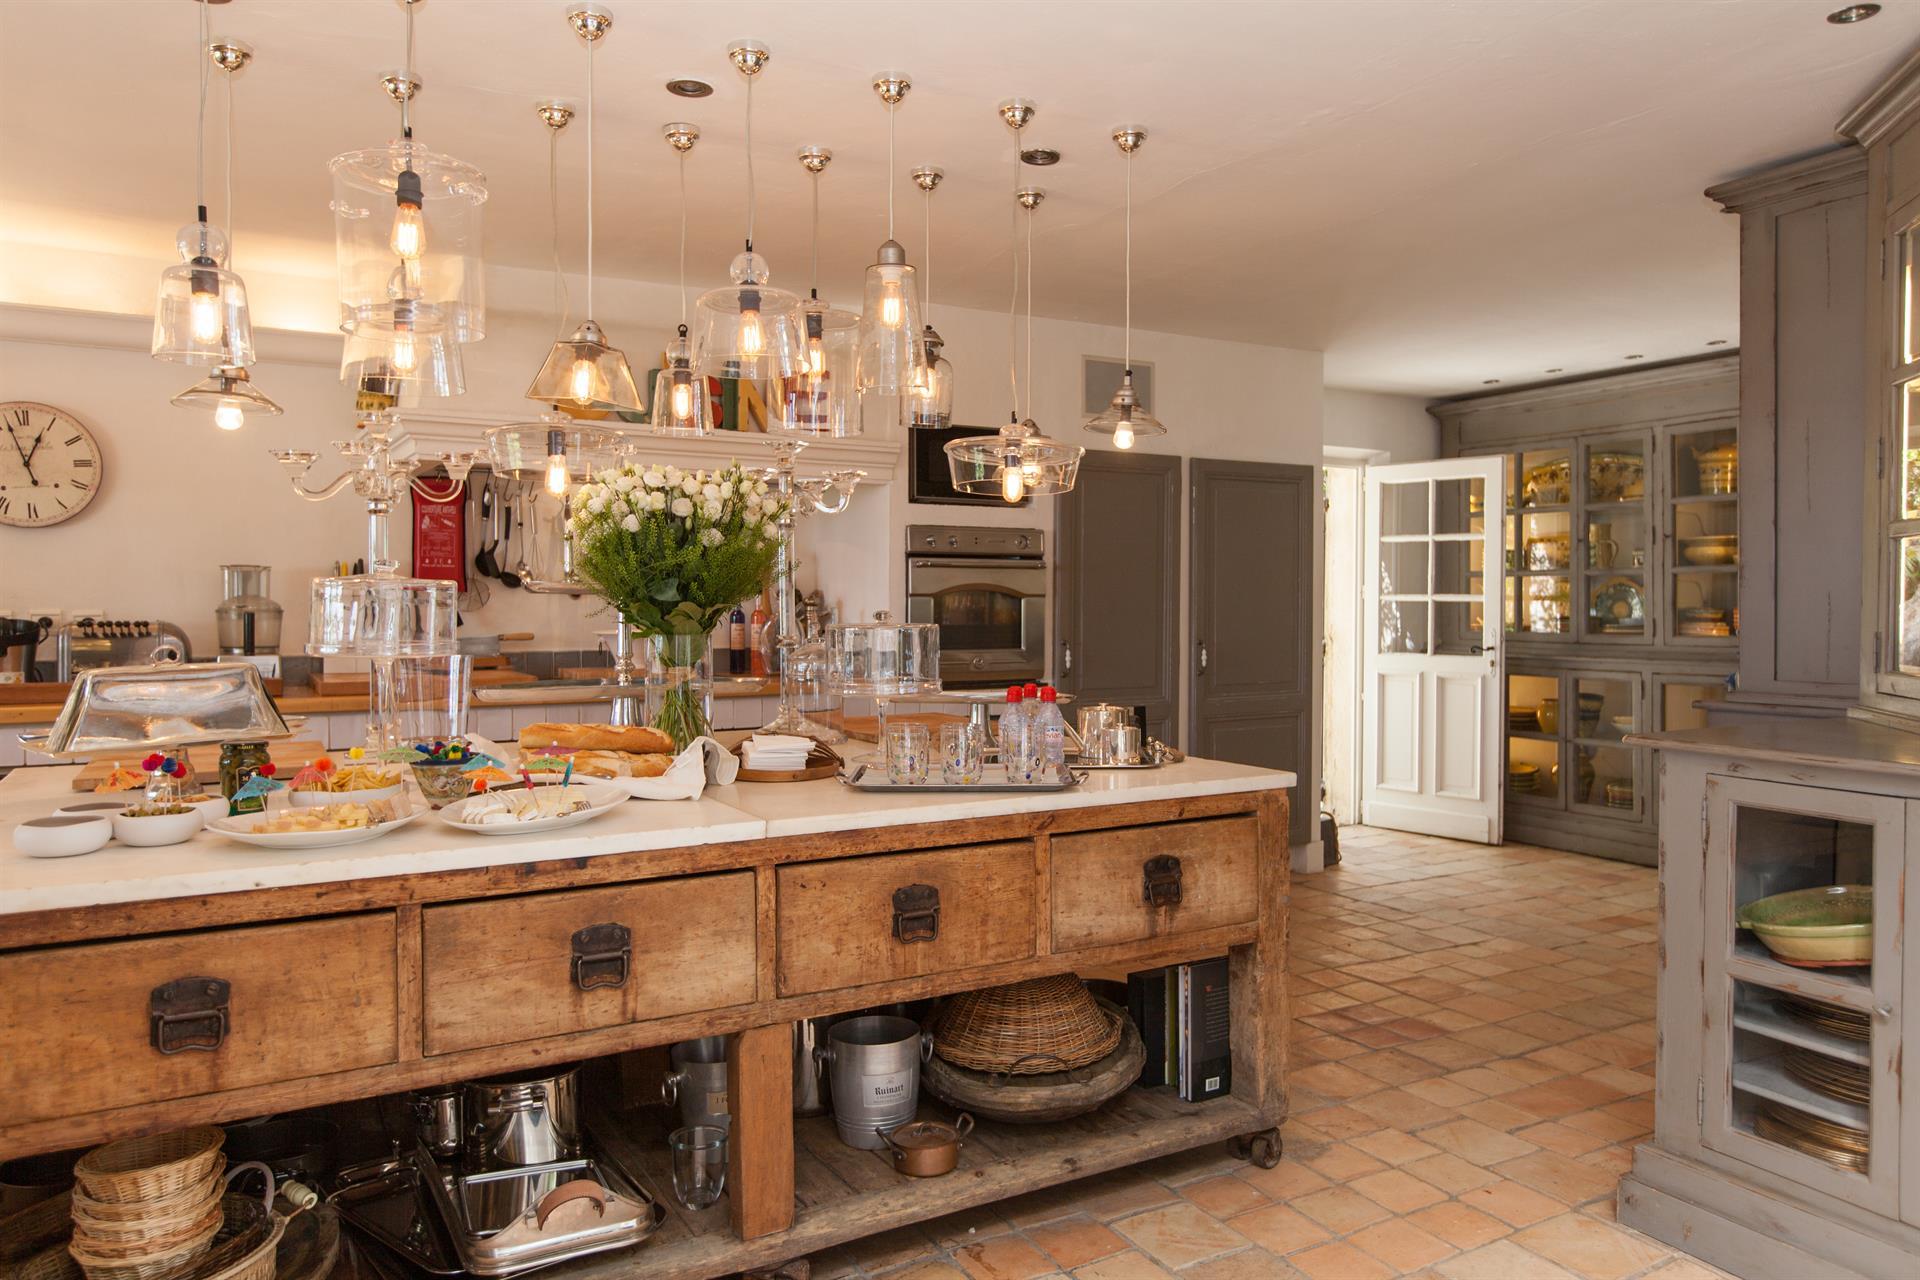 Ramatuelle Villa Salmanazar Une Maison De Luxe A A Vendre A